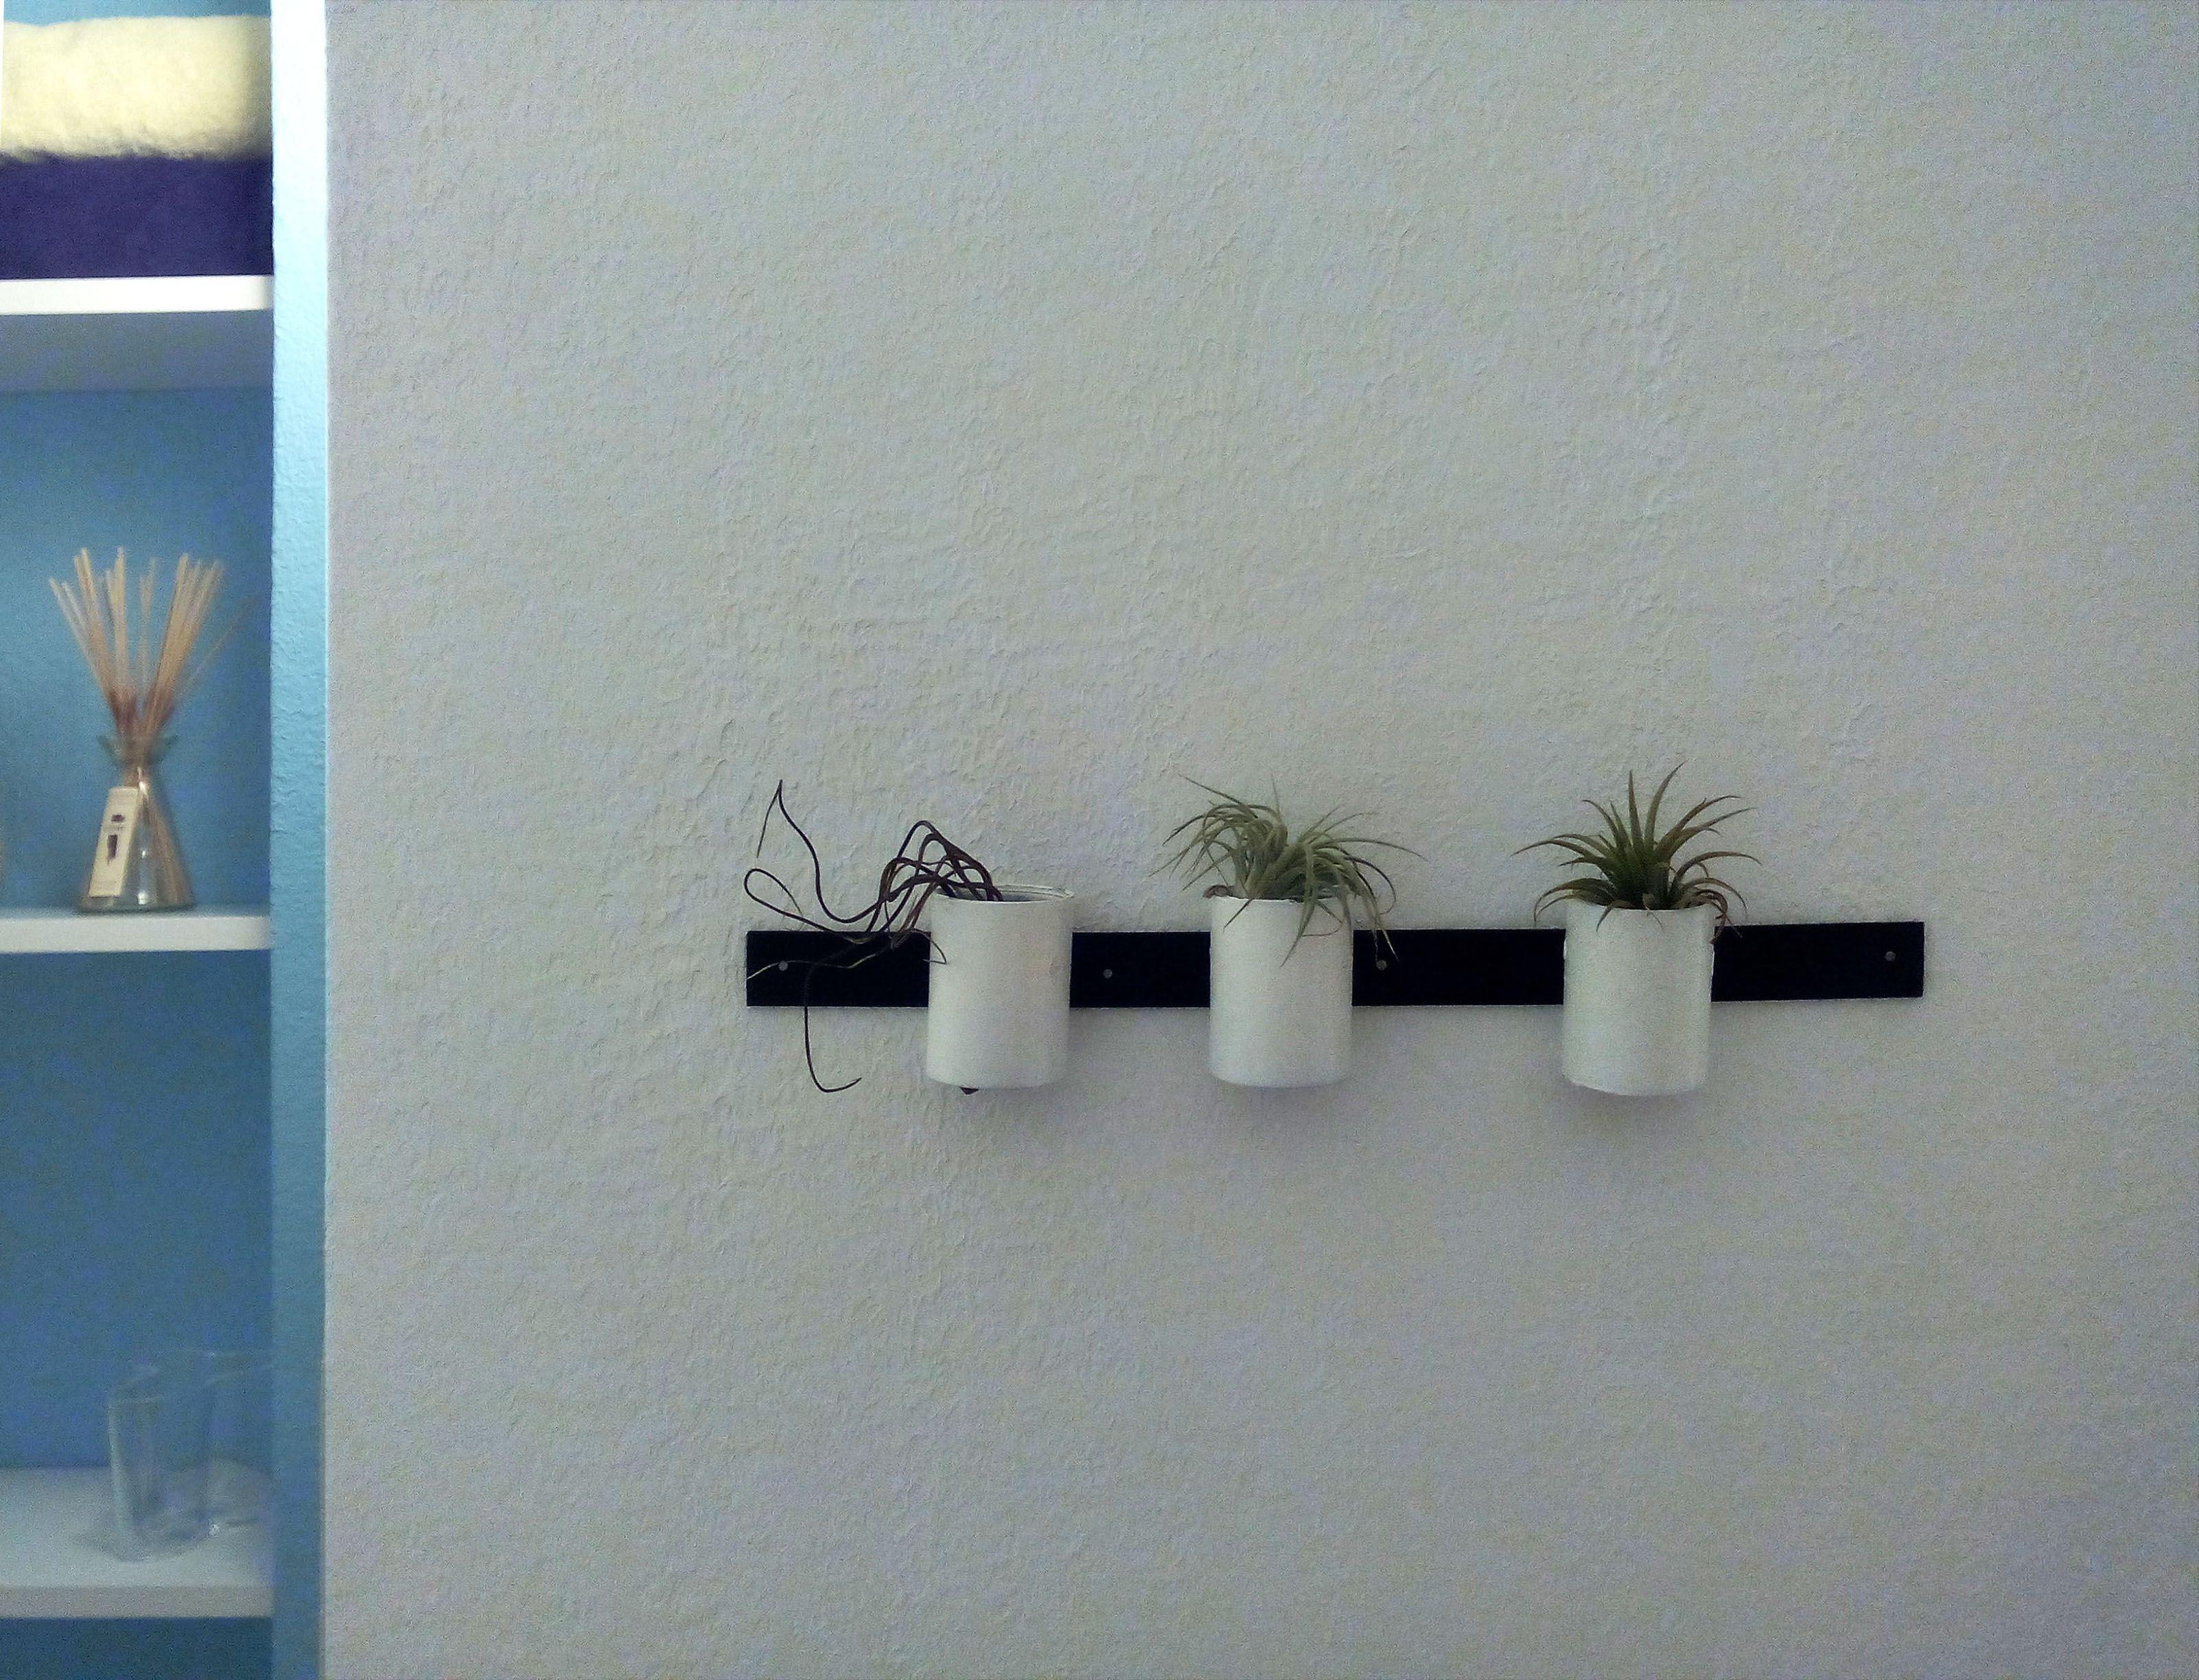 tillandsia piante aeree vasi decorazione bagno dcoration salle de bains bleu